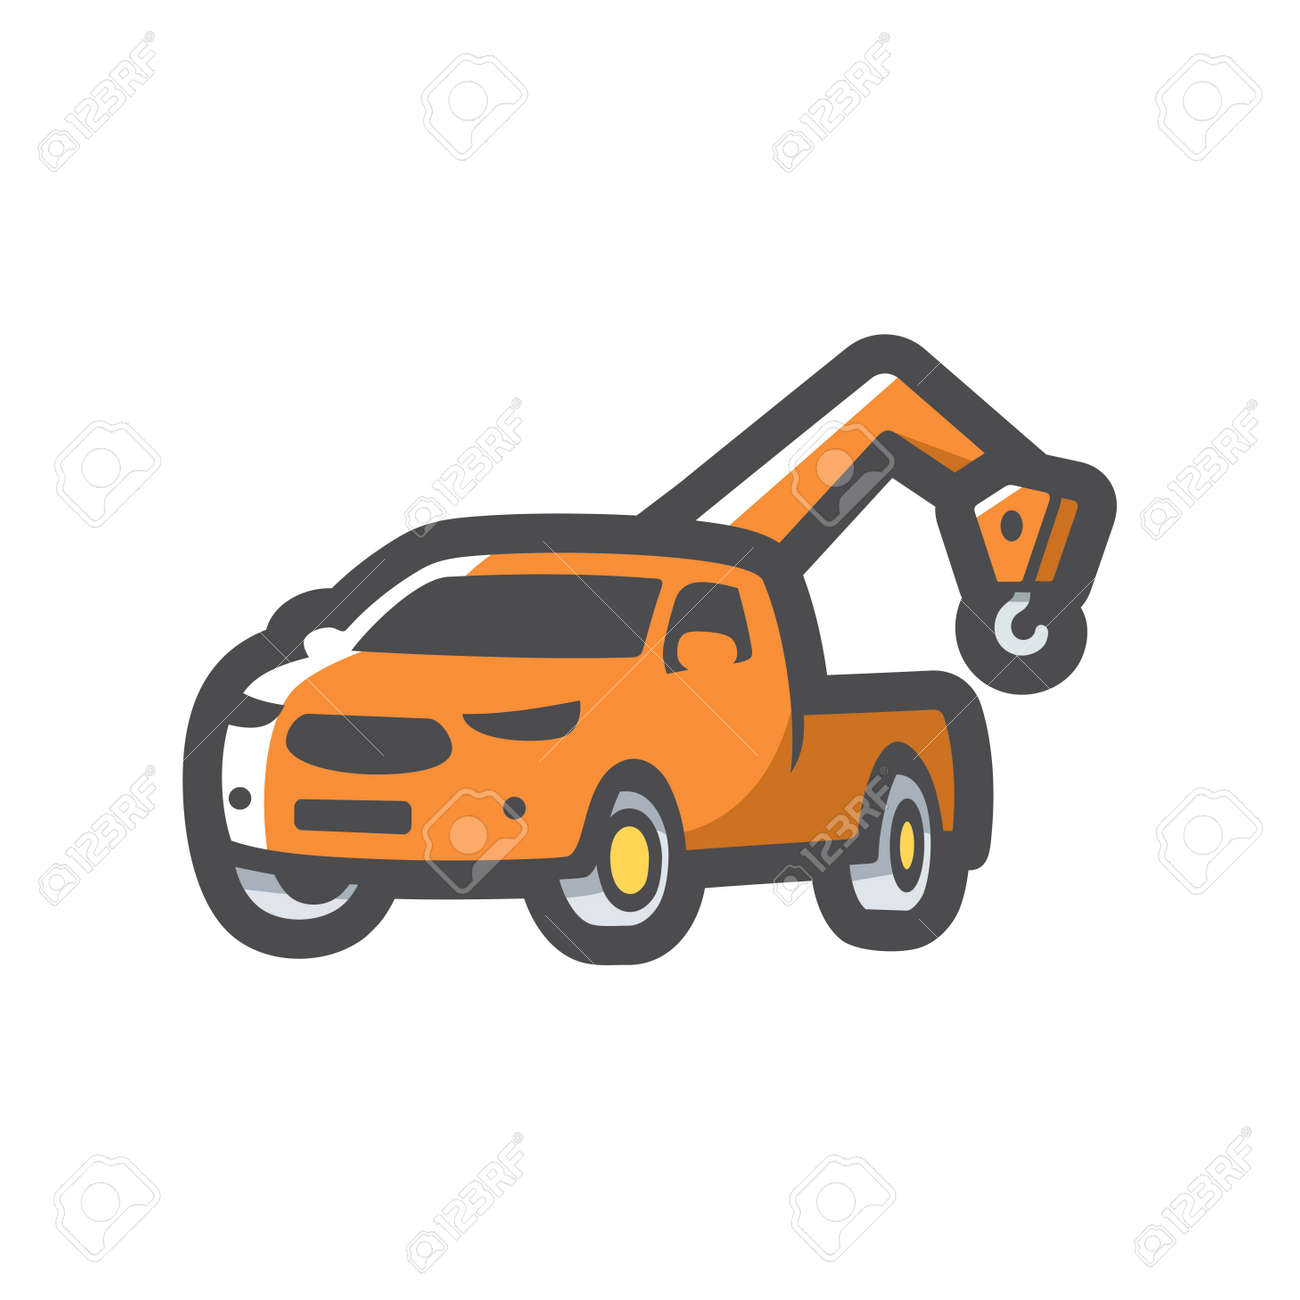 Tow wrecker pickup truck Vector icon Cartoon illustration. - 171392926